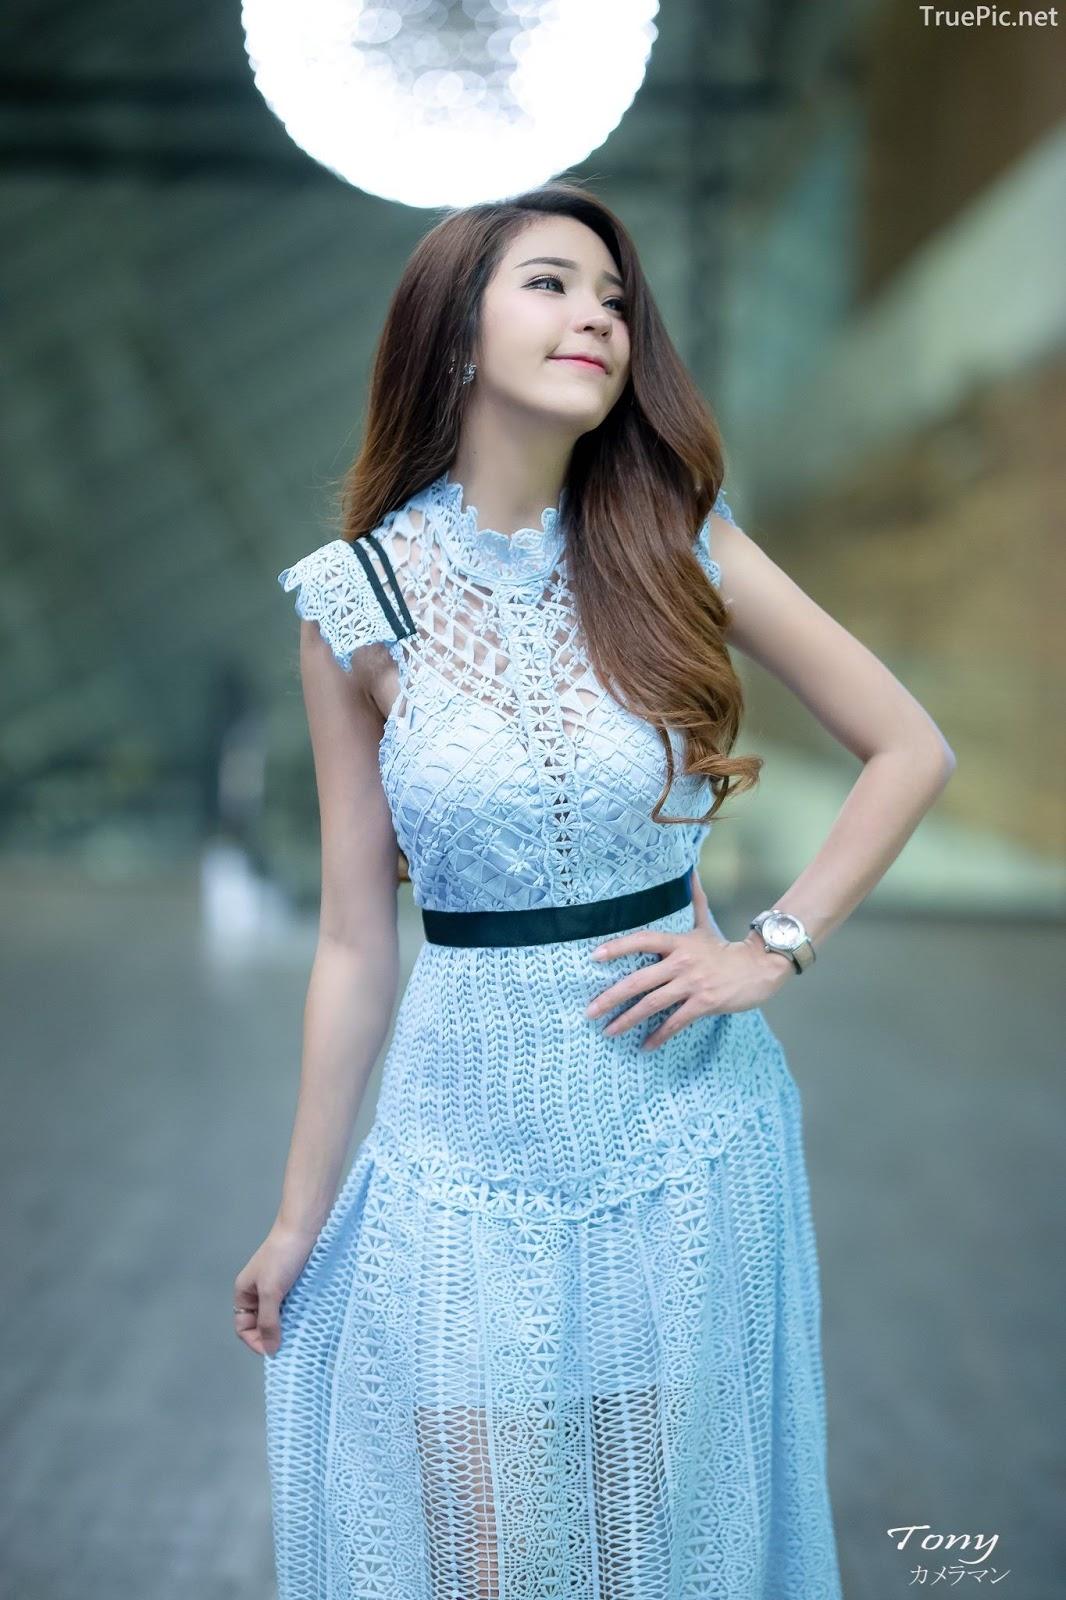 Thailand hot model – Janet Kanokwan Saesim – Sexy vs Cute and Bra vs Long Dress - Picture 3